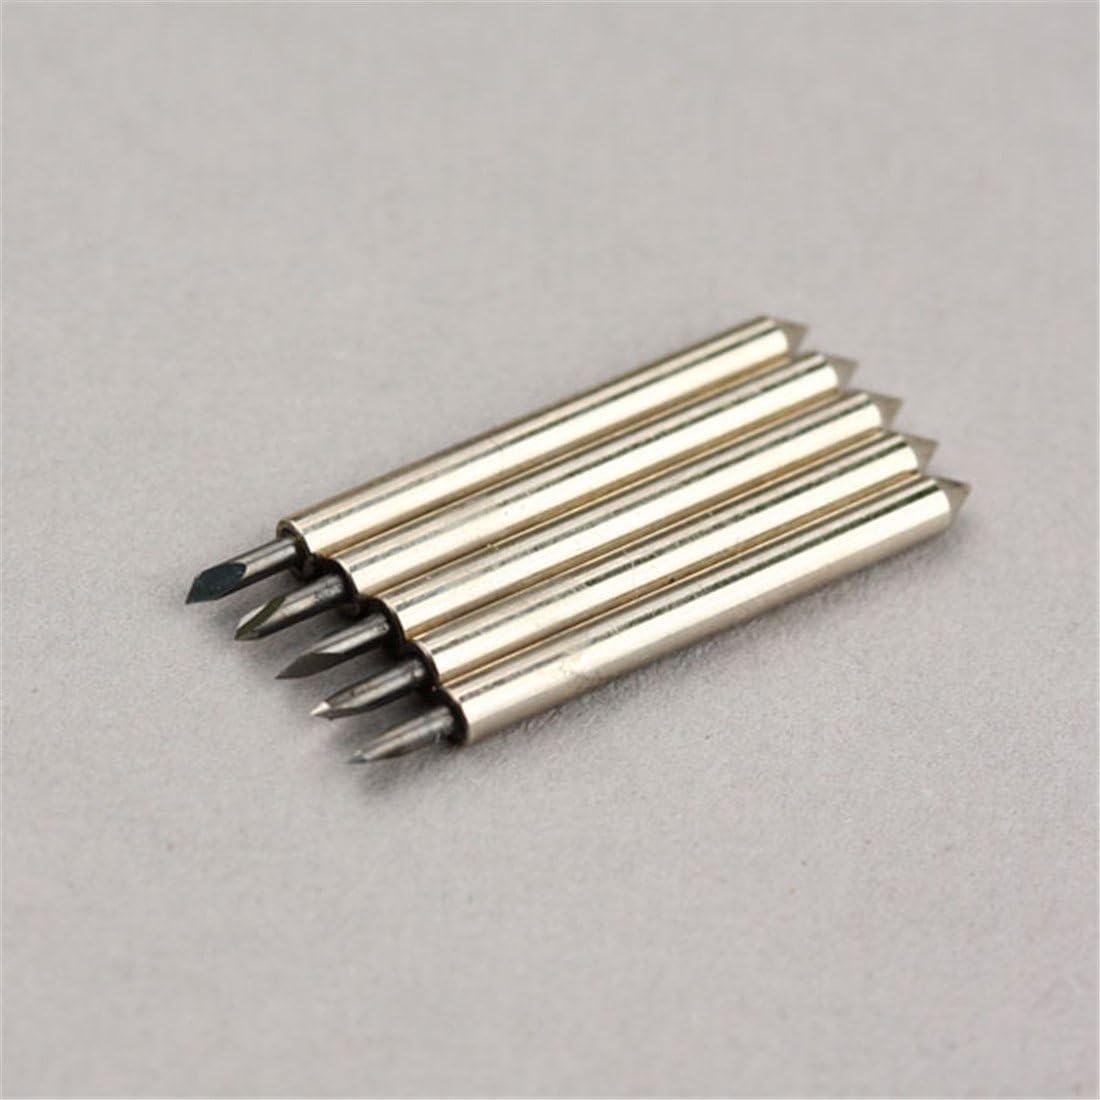 SMO 5 x 45° High quality Roland vinilo neutralware cutter blades ...